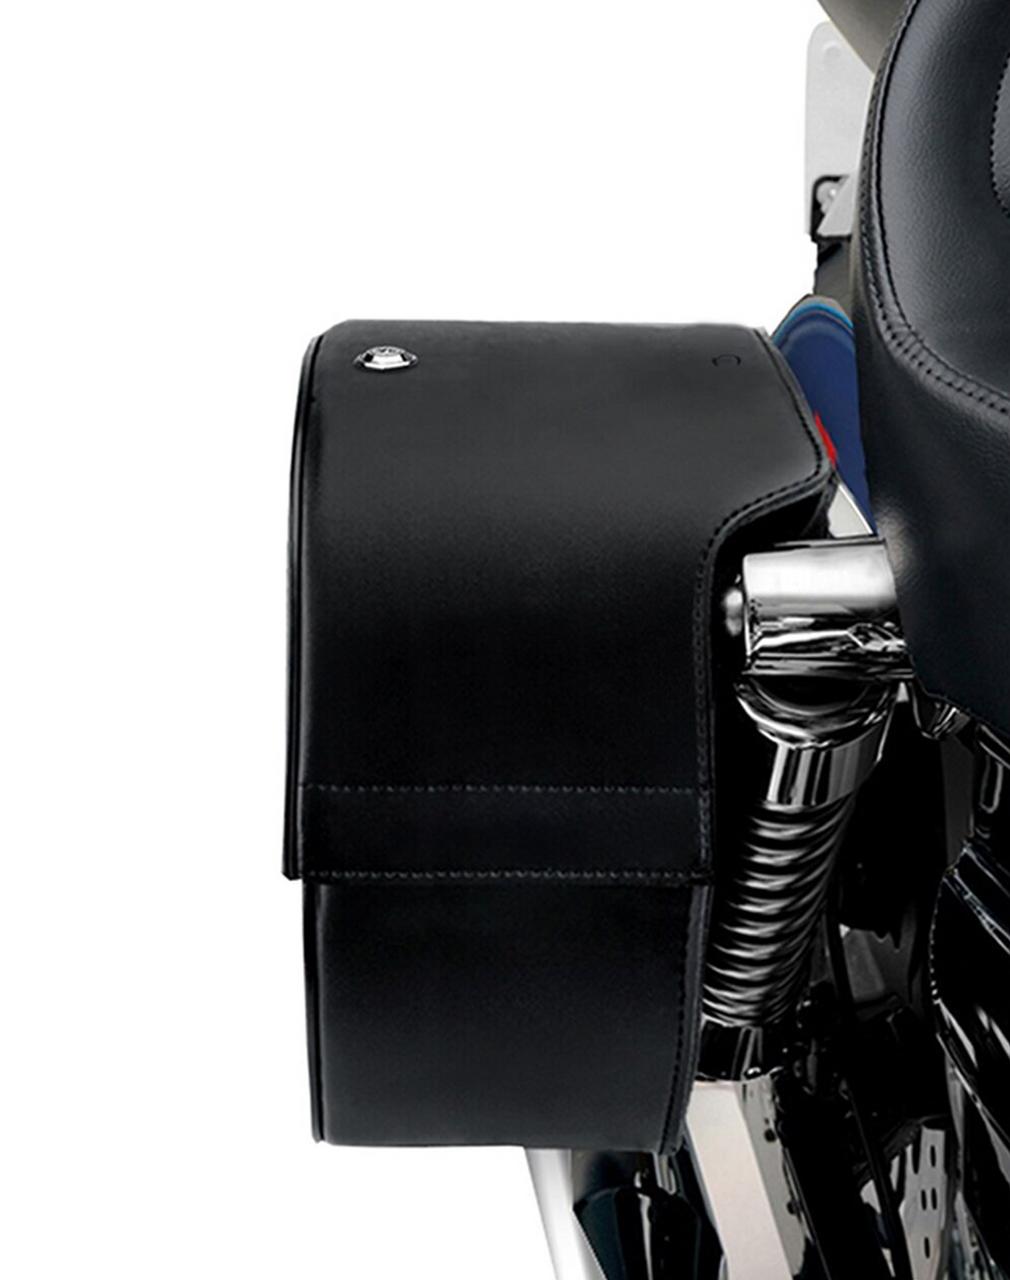 Triumph Thunderbird Shock Cutout Slanted Large Motorcycle Saddlebags Shock Cutout View